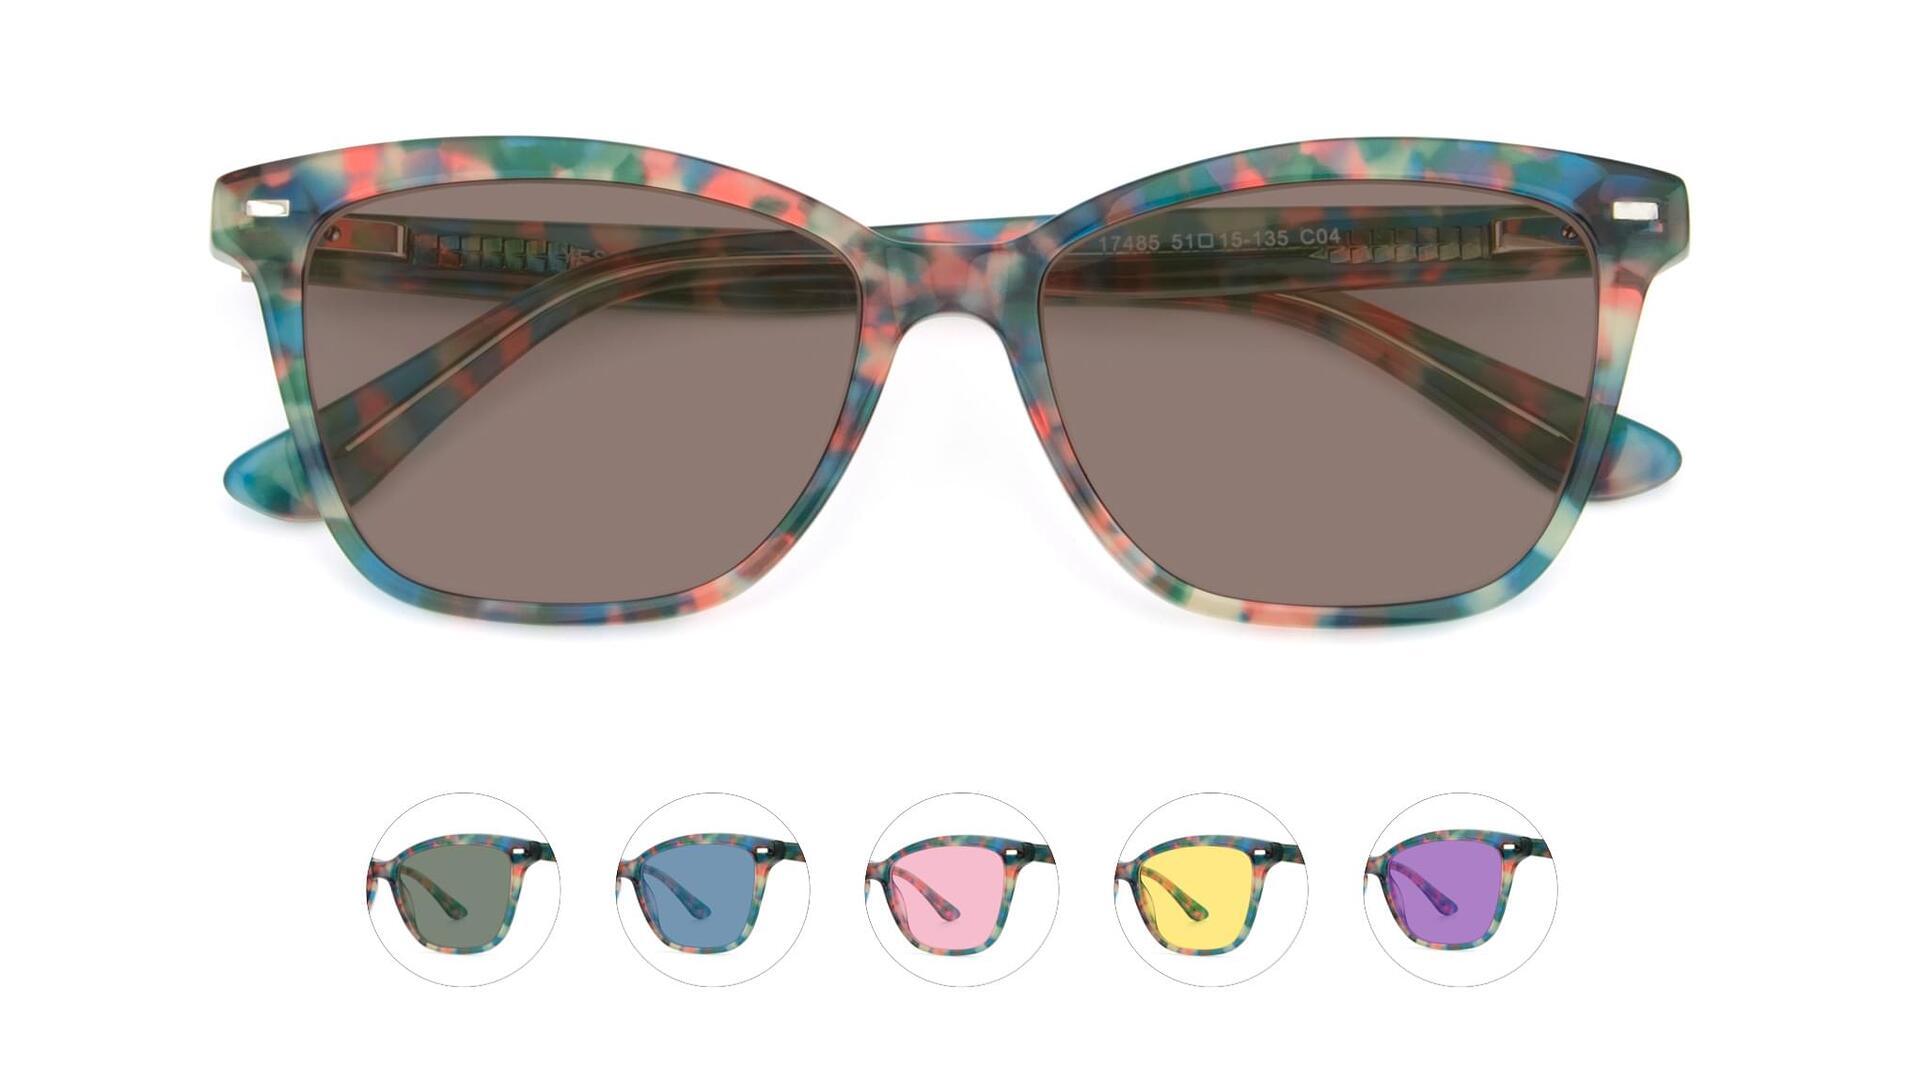 Floral Tortoise Retro-Vintage Acetate Cat-Eye Tinted Sunglasses